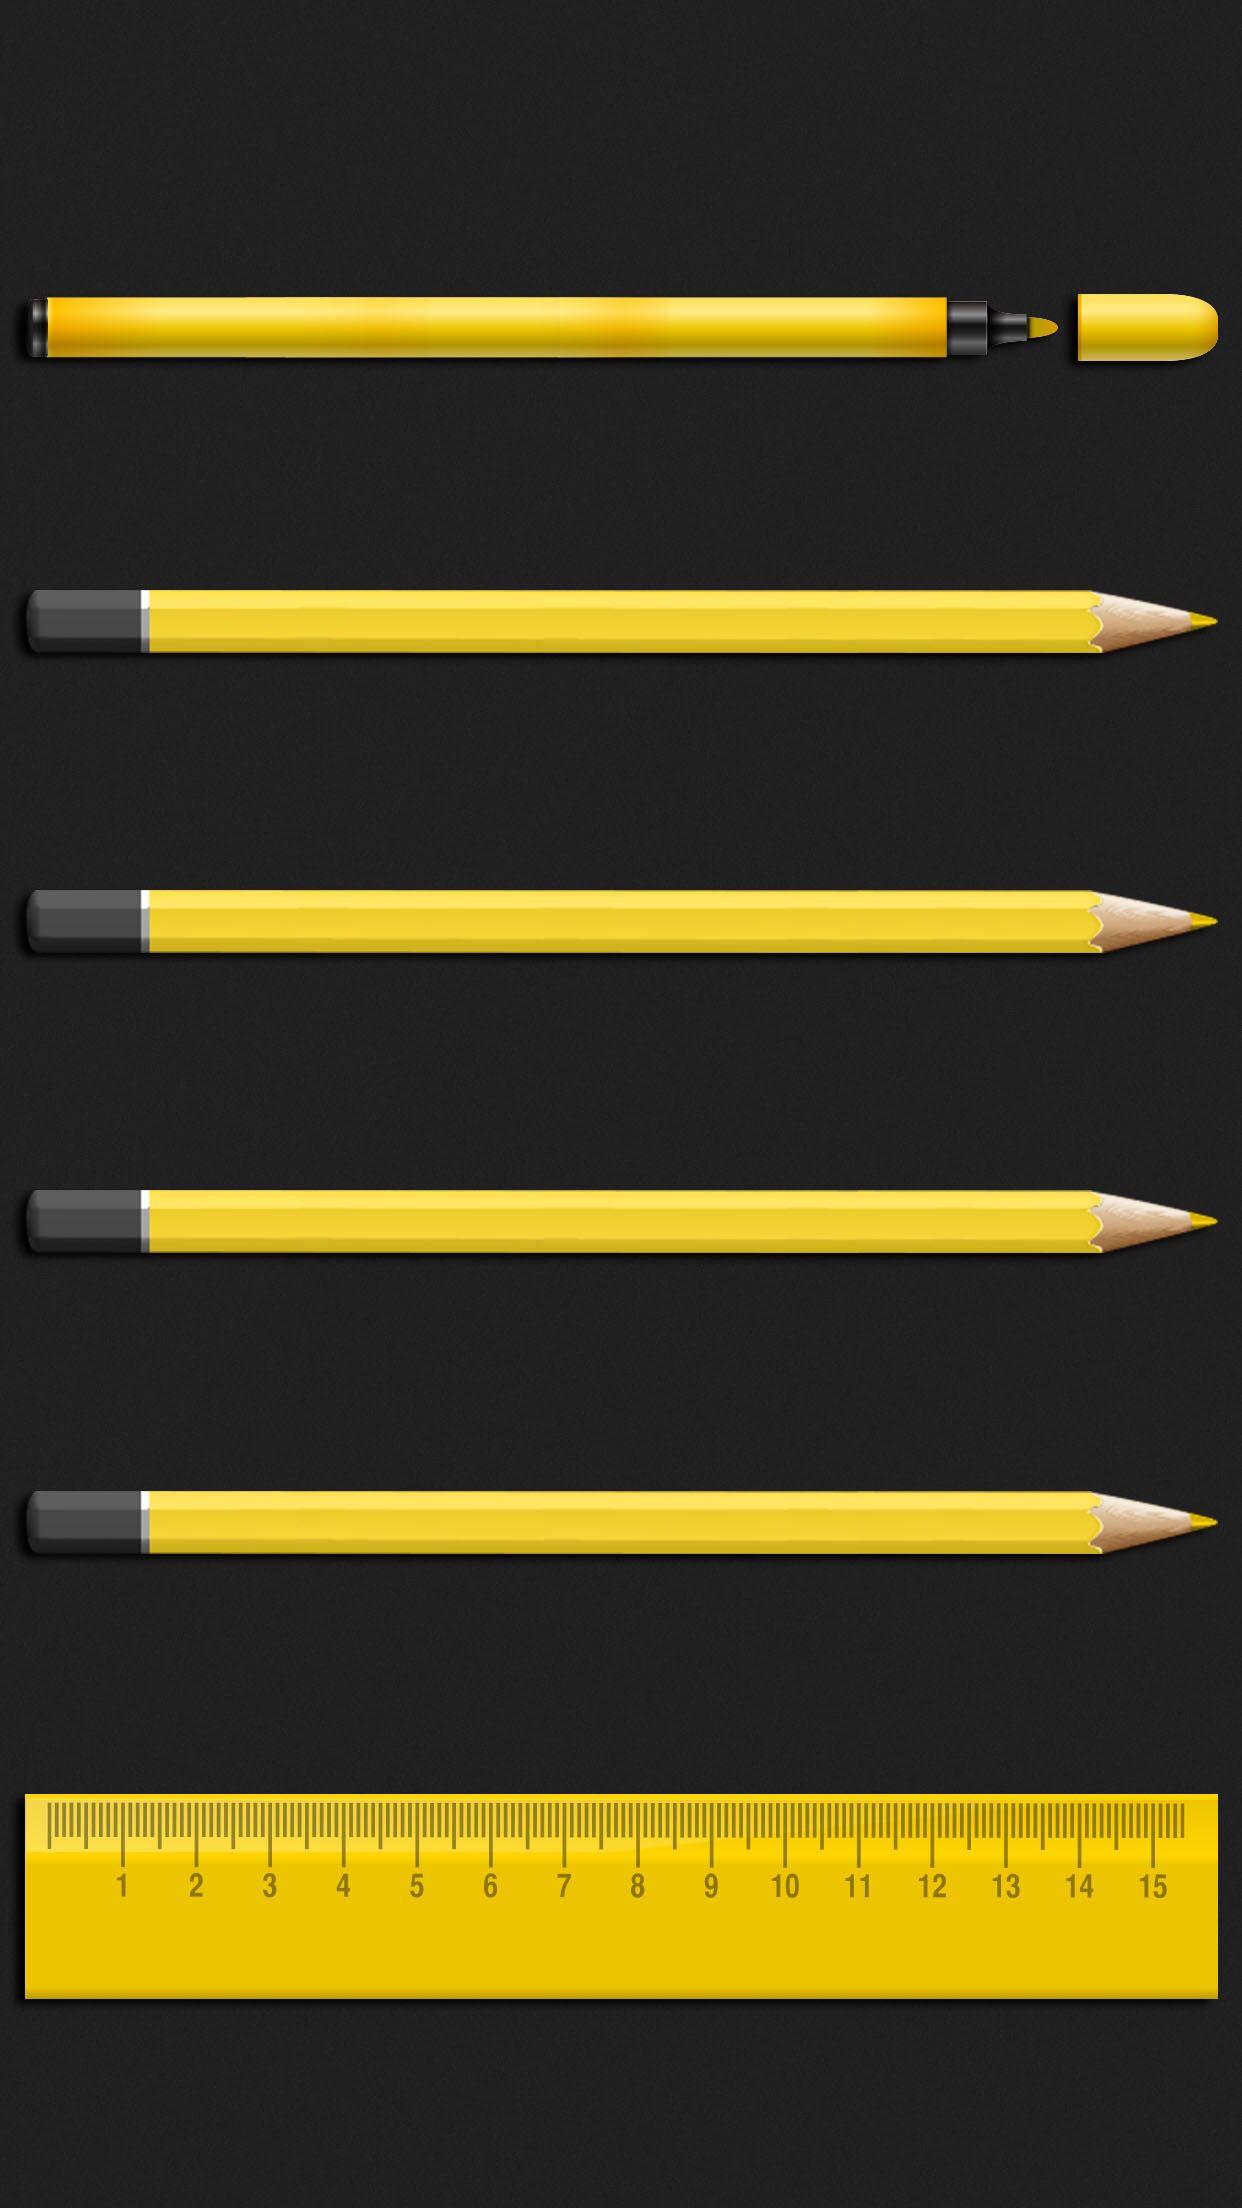 pencil and ruler shelf wallpaper